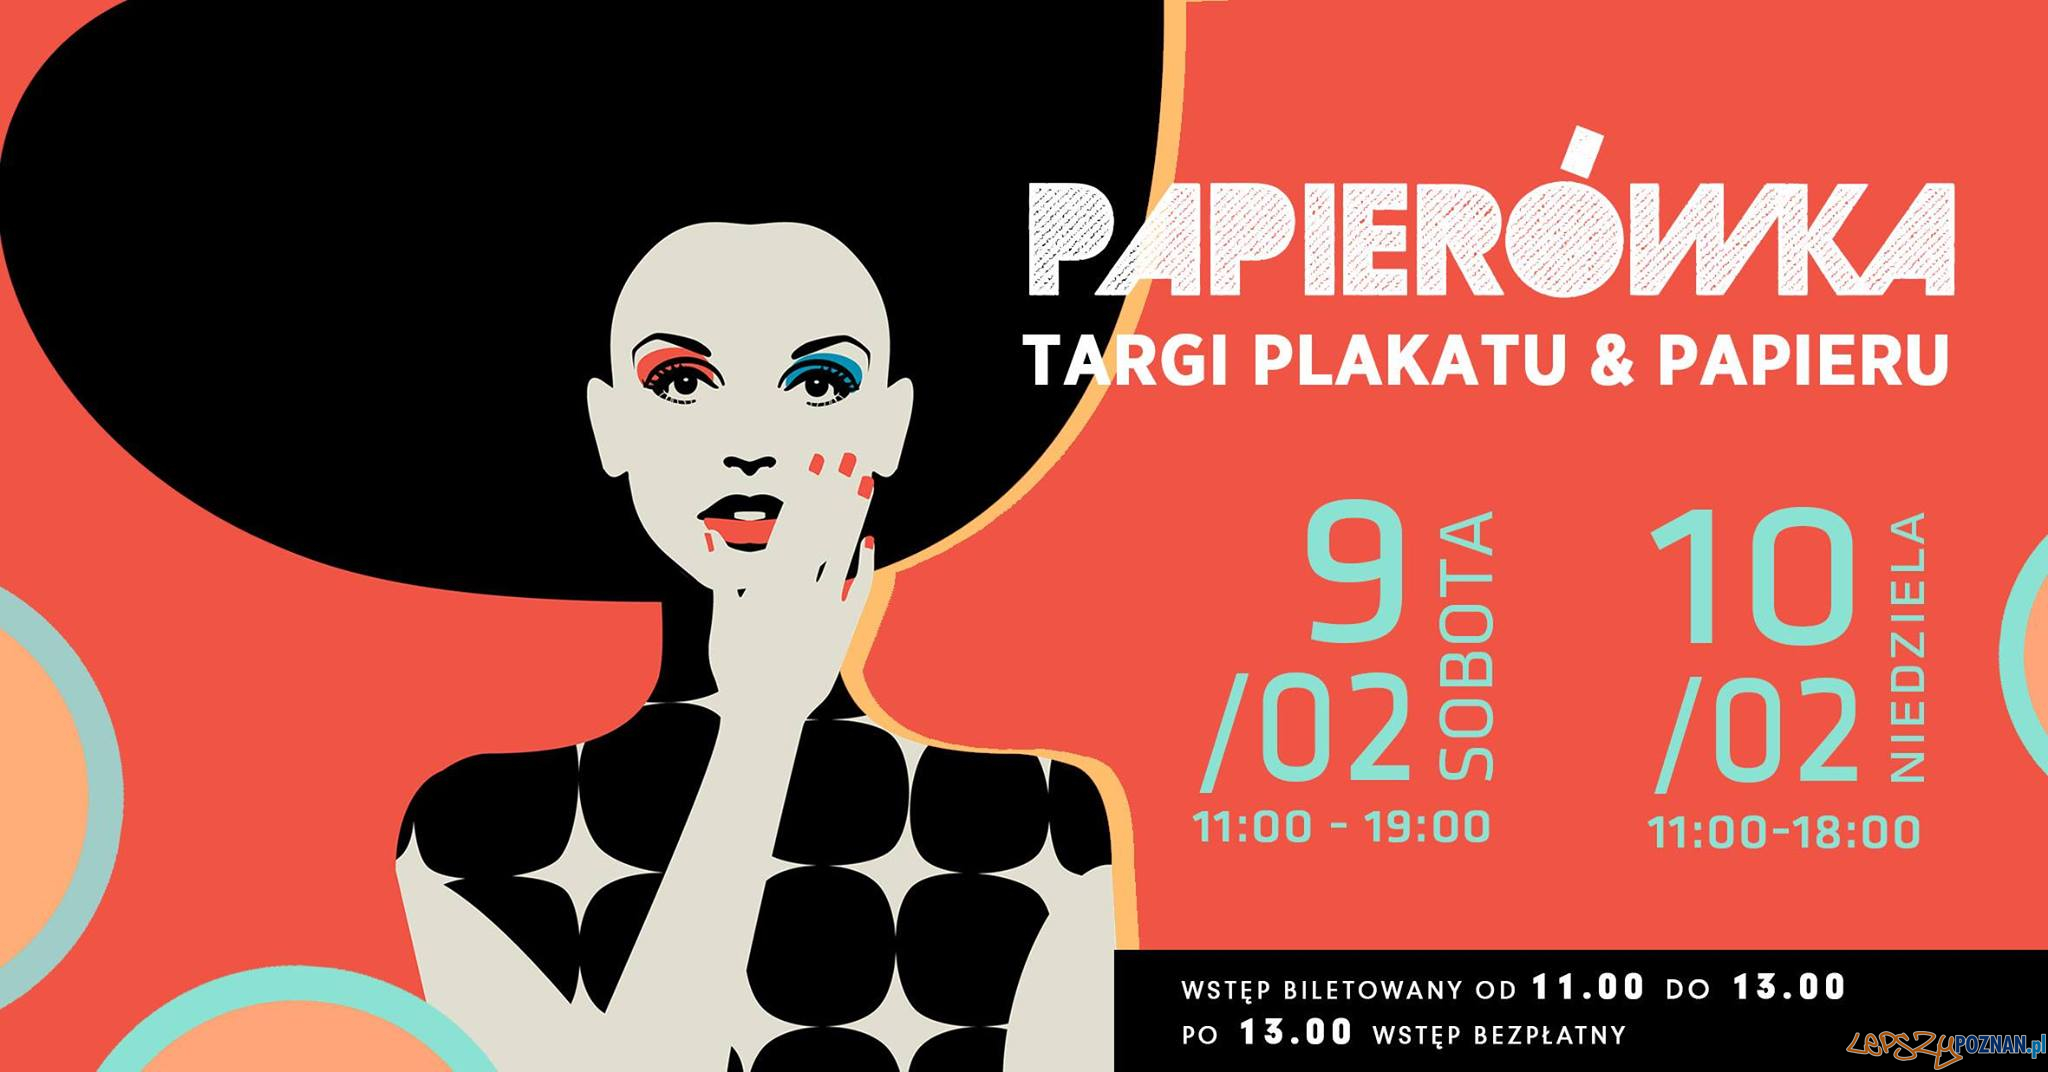 Papierówka - targi plakatu i papieru  Foto: materiały prasowe